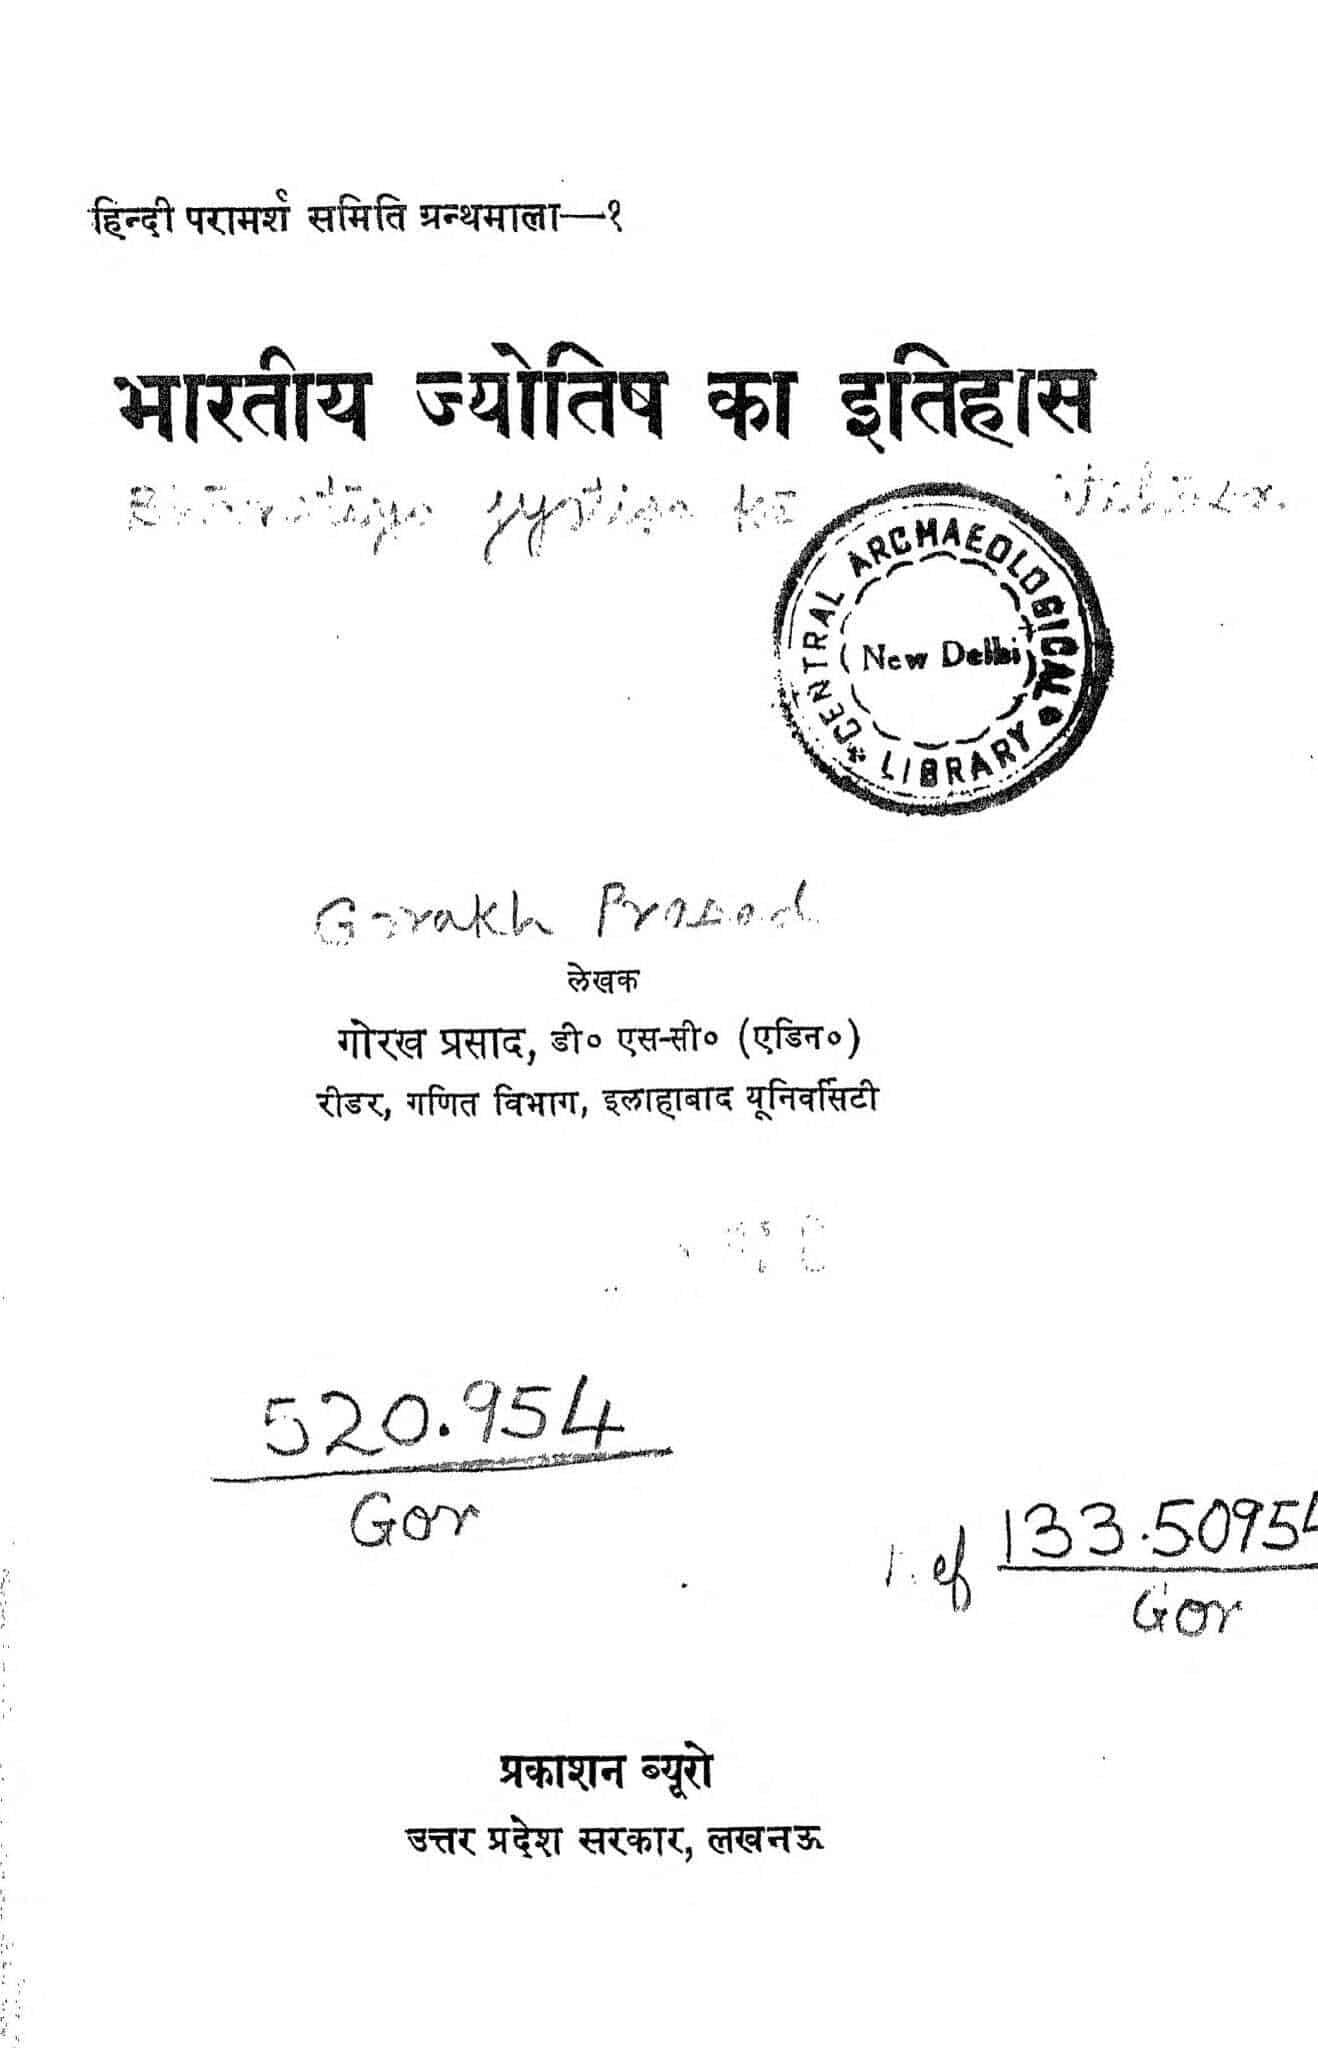 Bhartiya Jyotisa Ka Itihas by गोरख प्रसाद - Gorakh Prasad